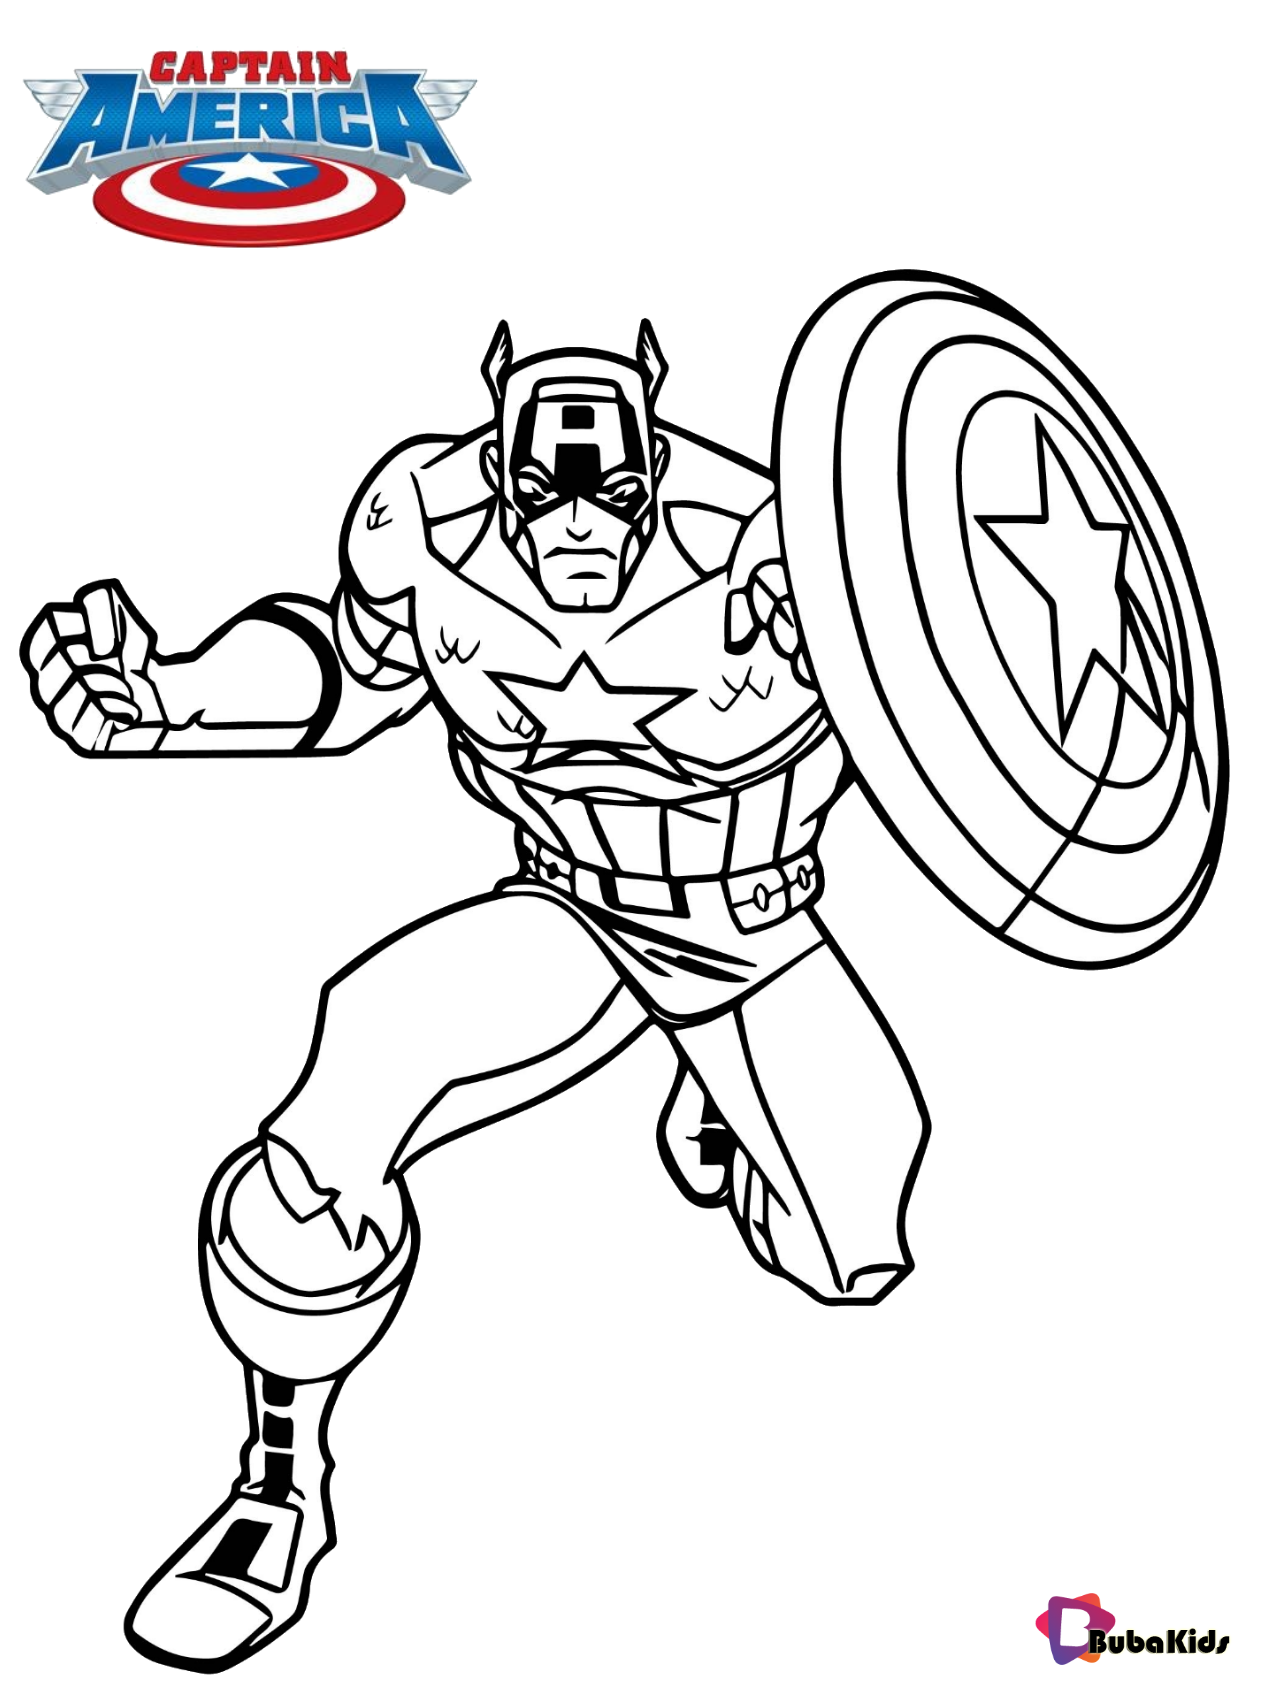 Captain America superhero coloring page for kids en 2020 ...